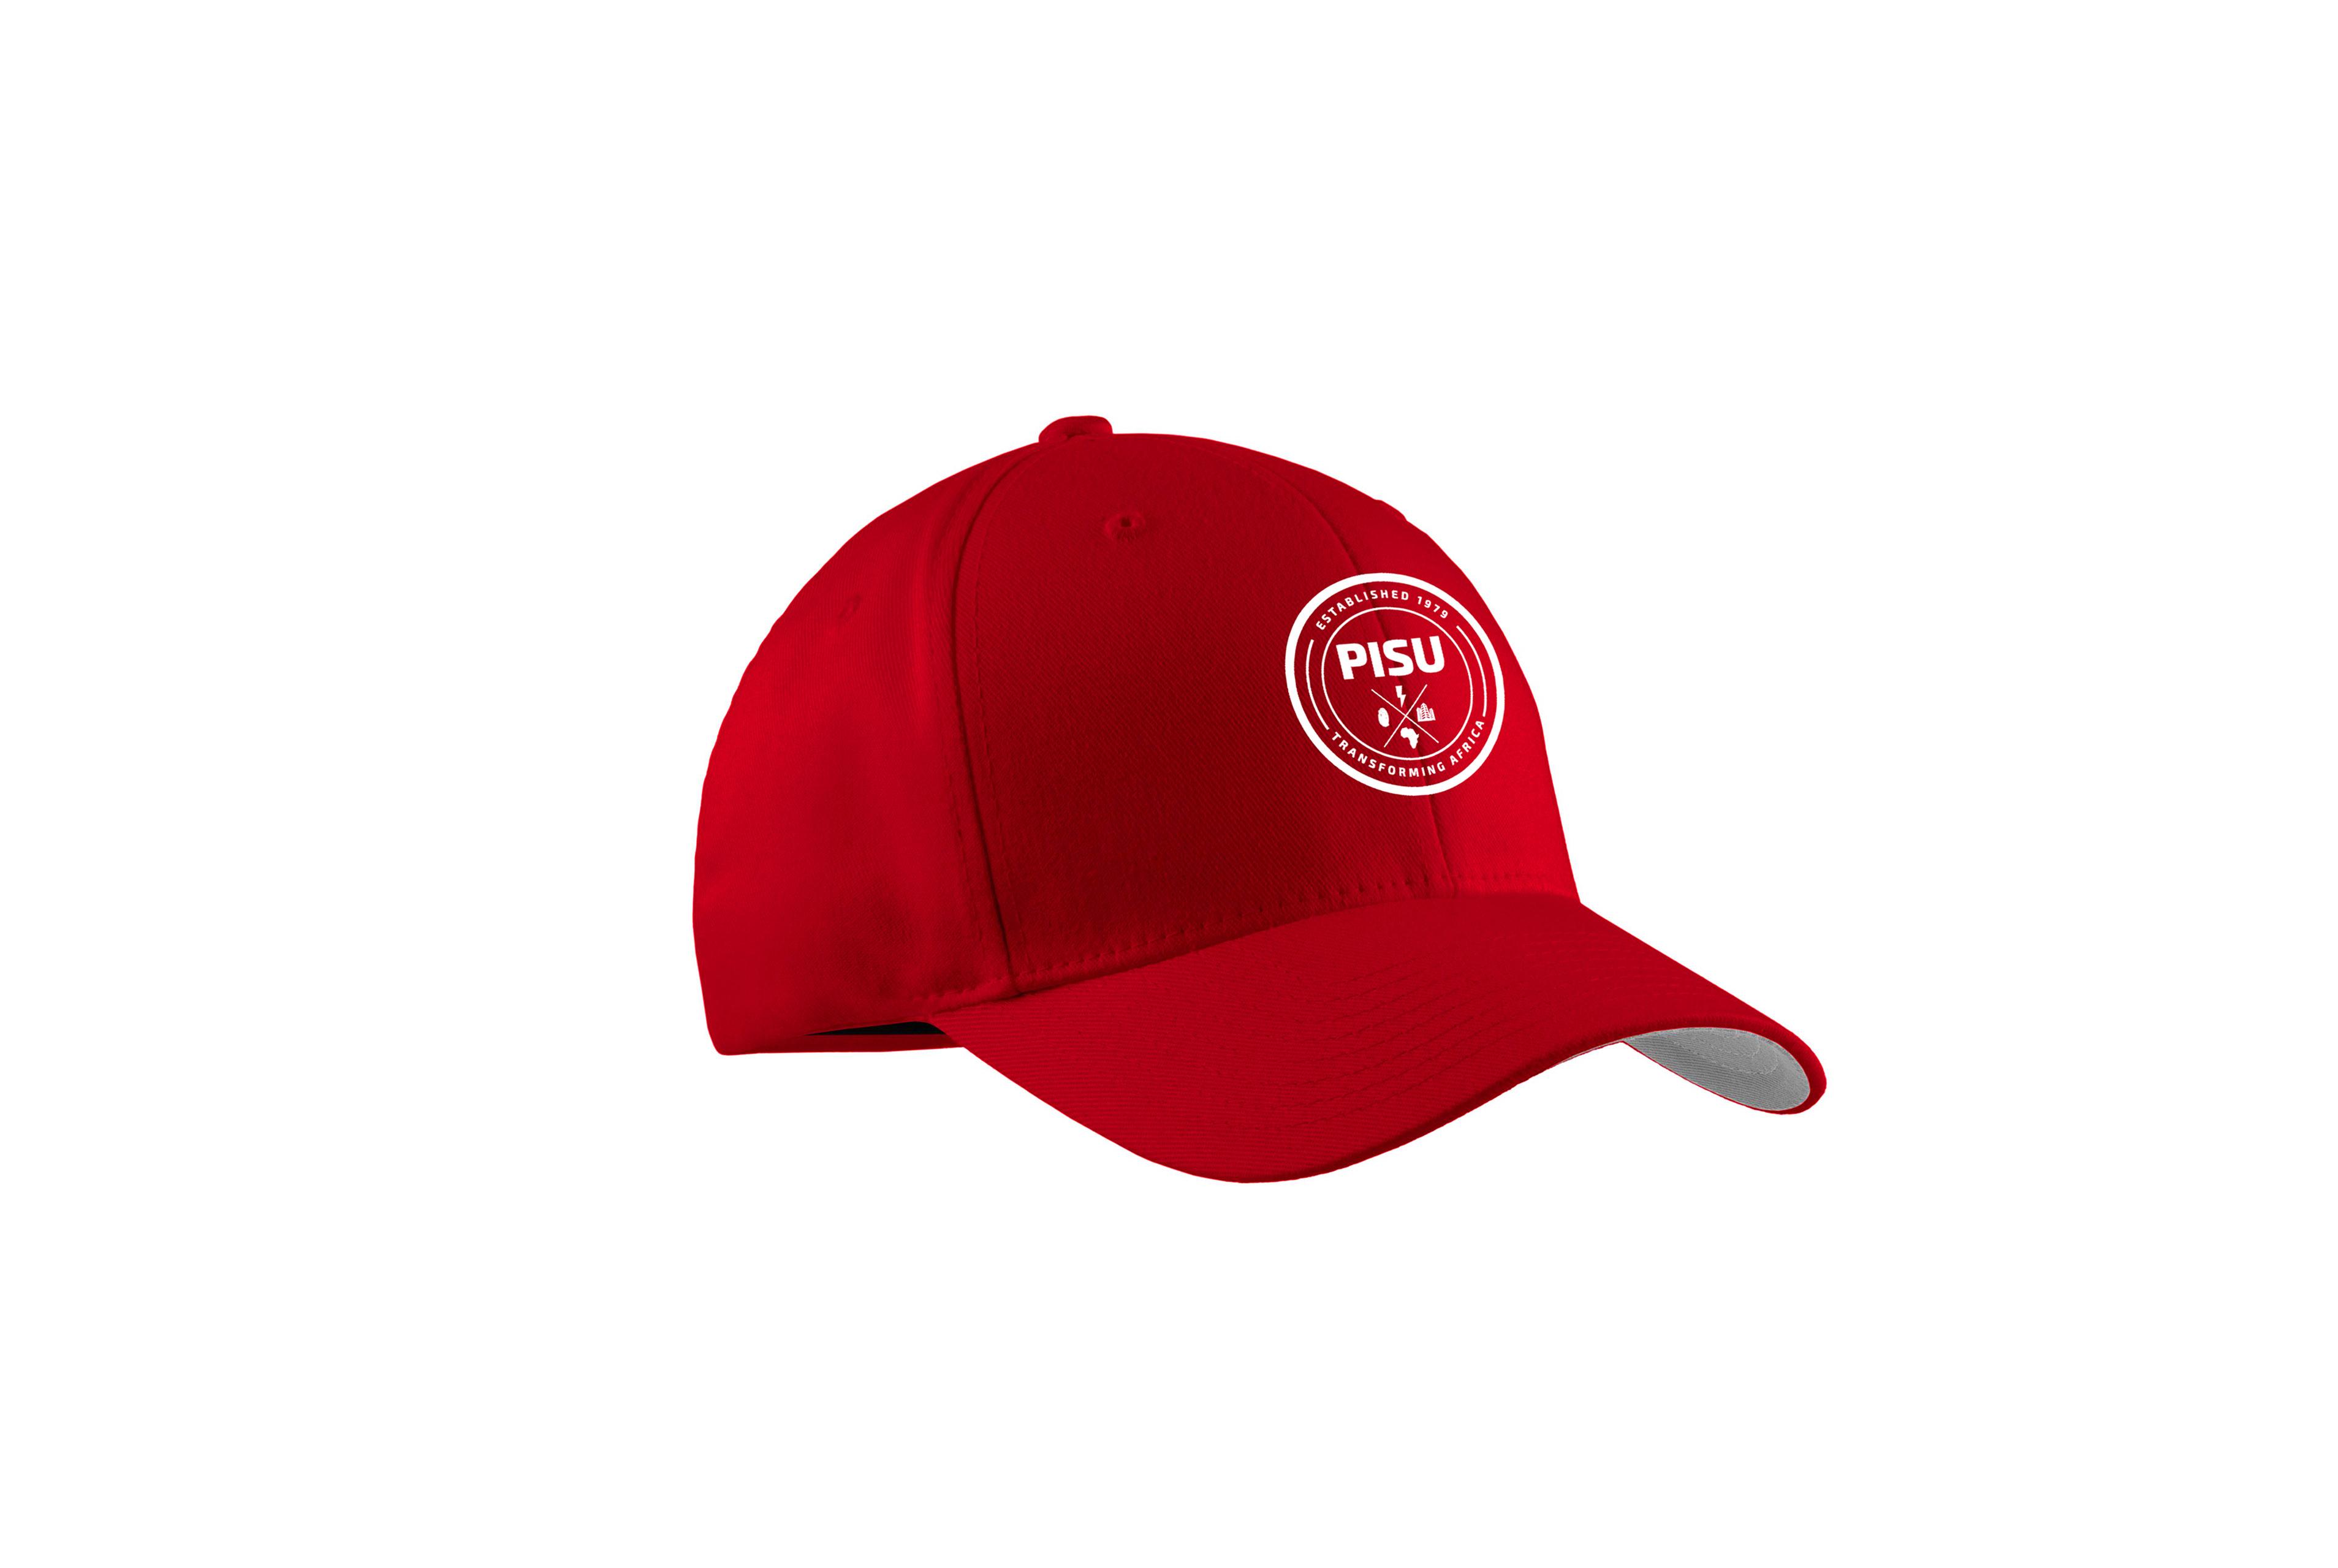 PISU BaseballCap_969x650